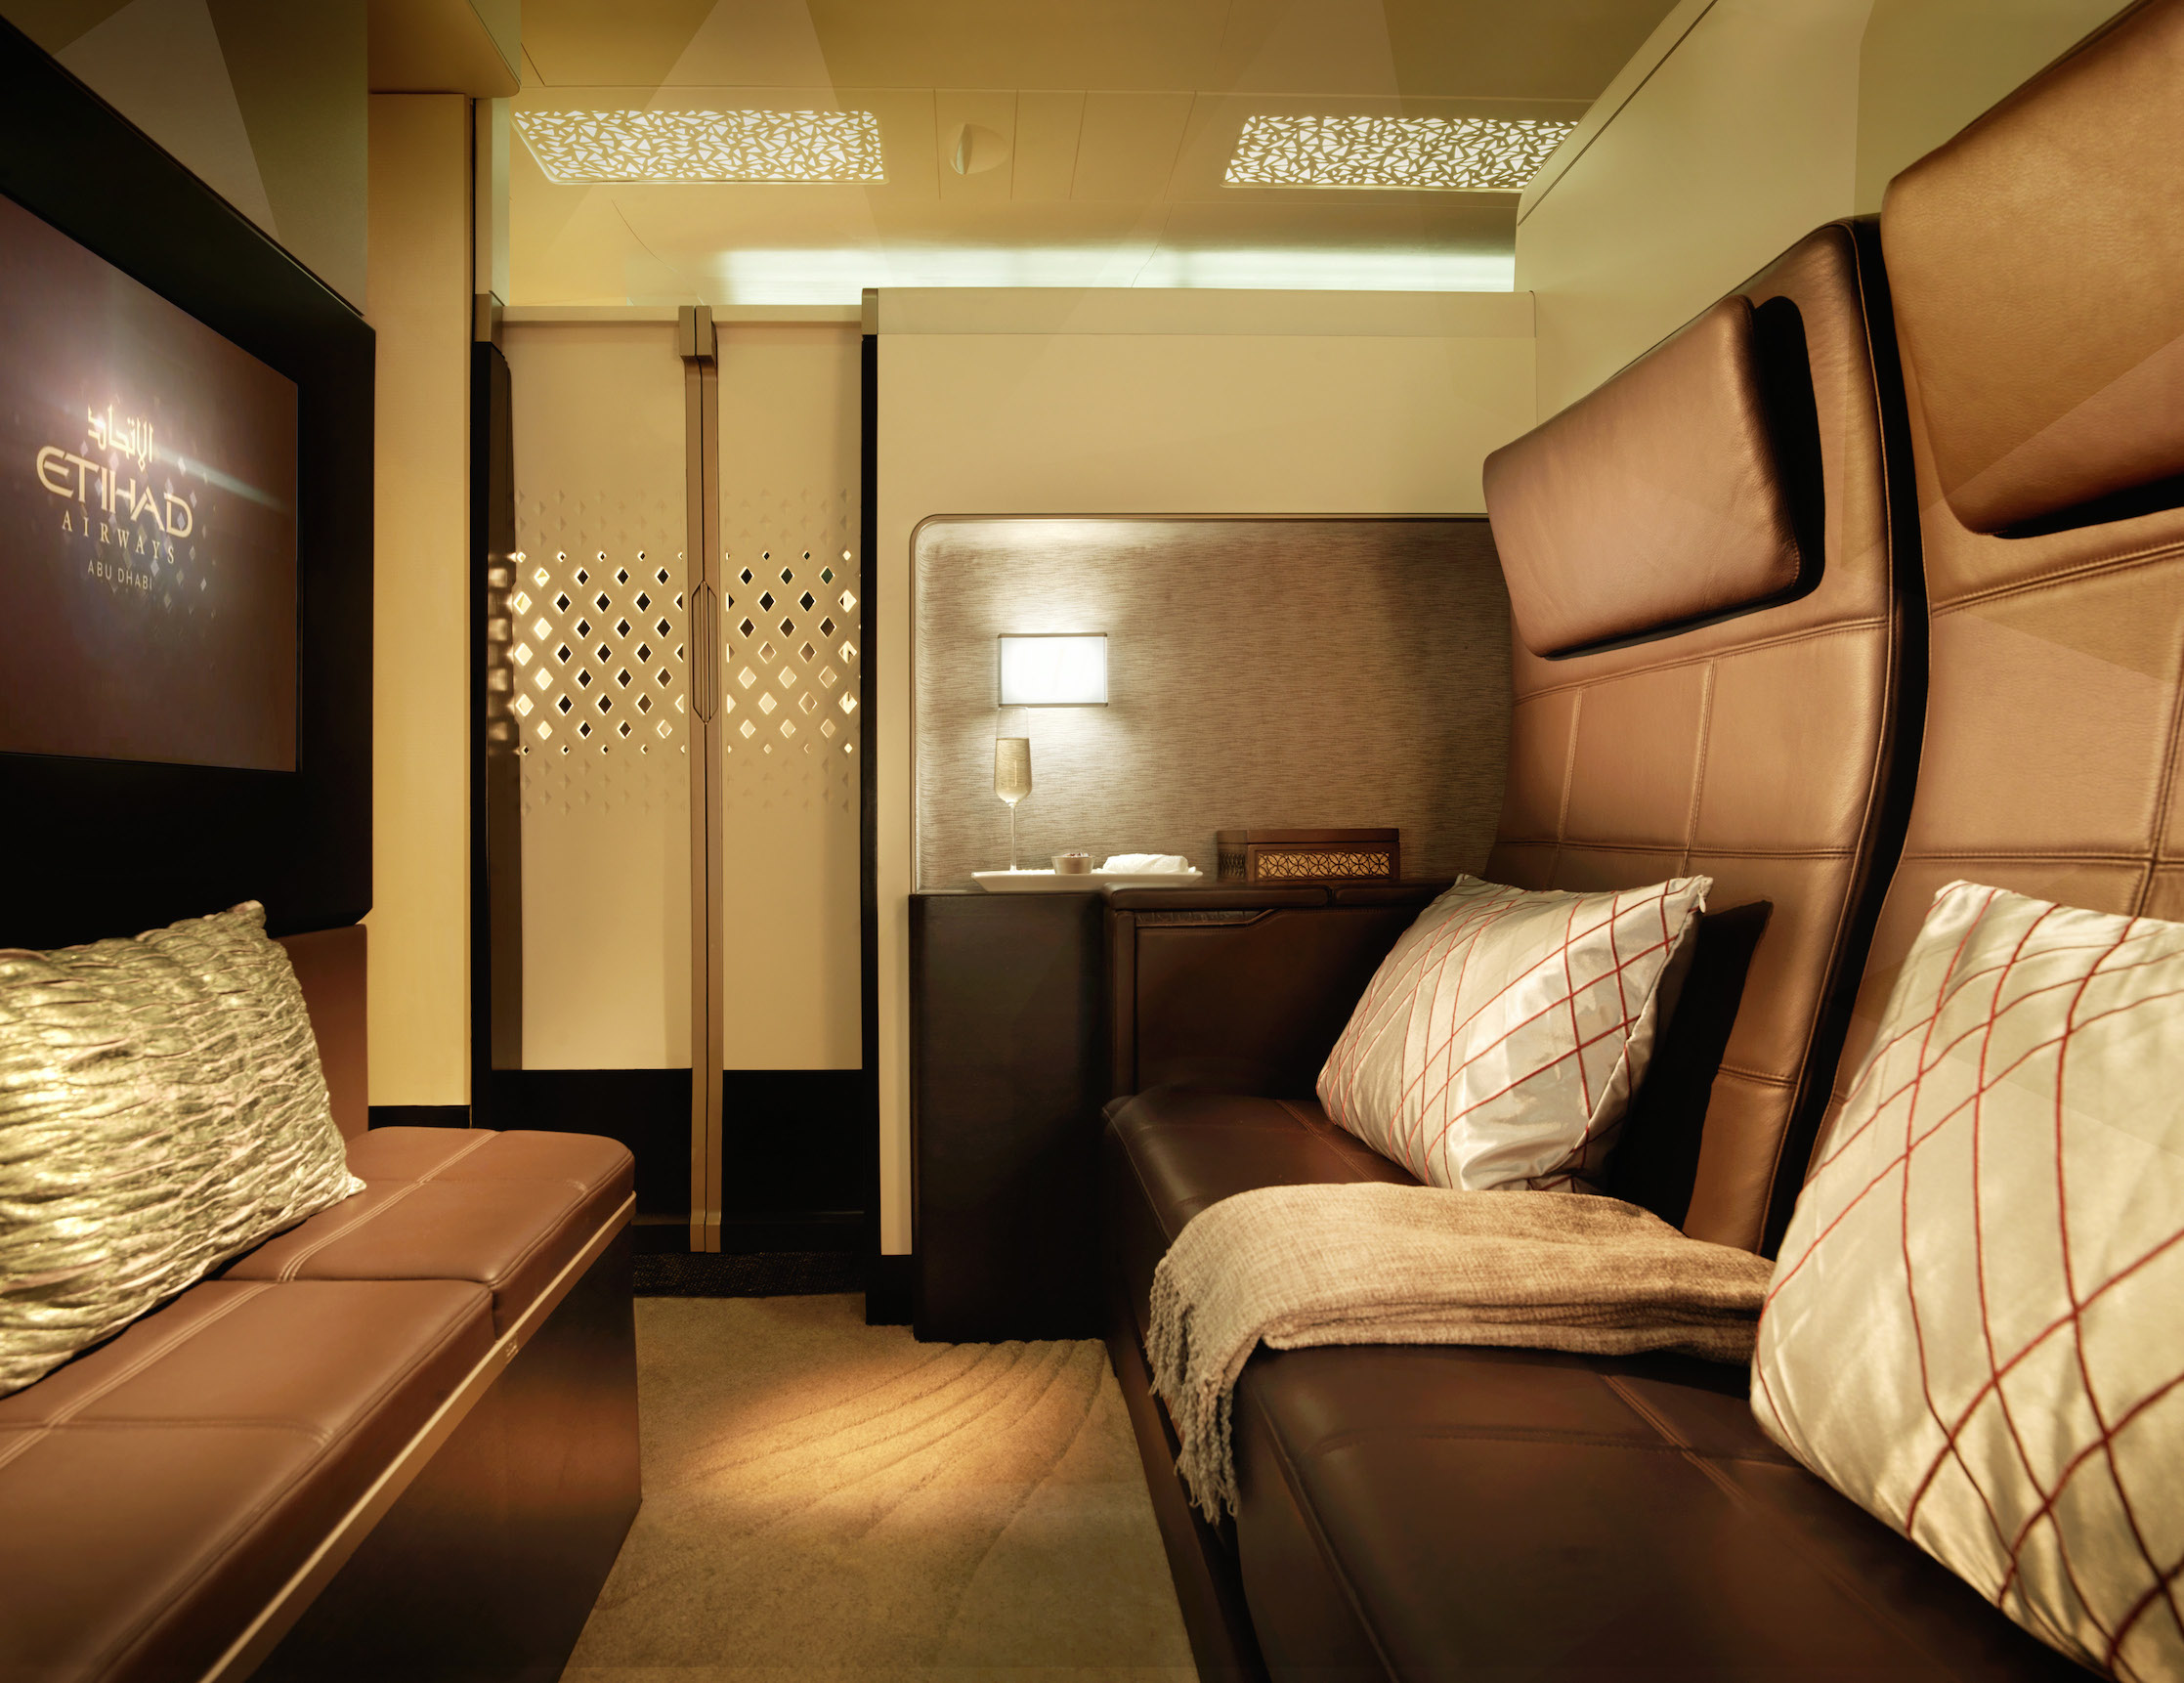 The_Residence-_Etihad_Airways